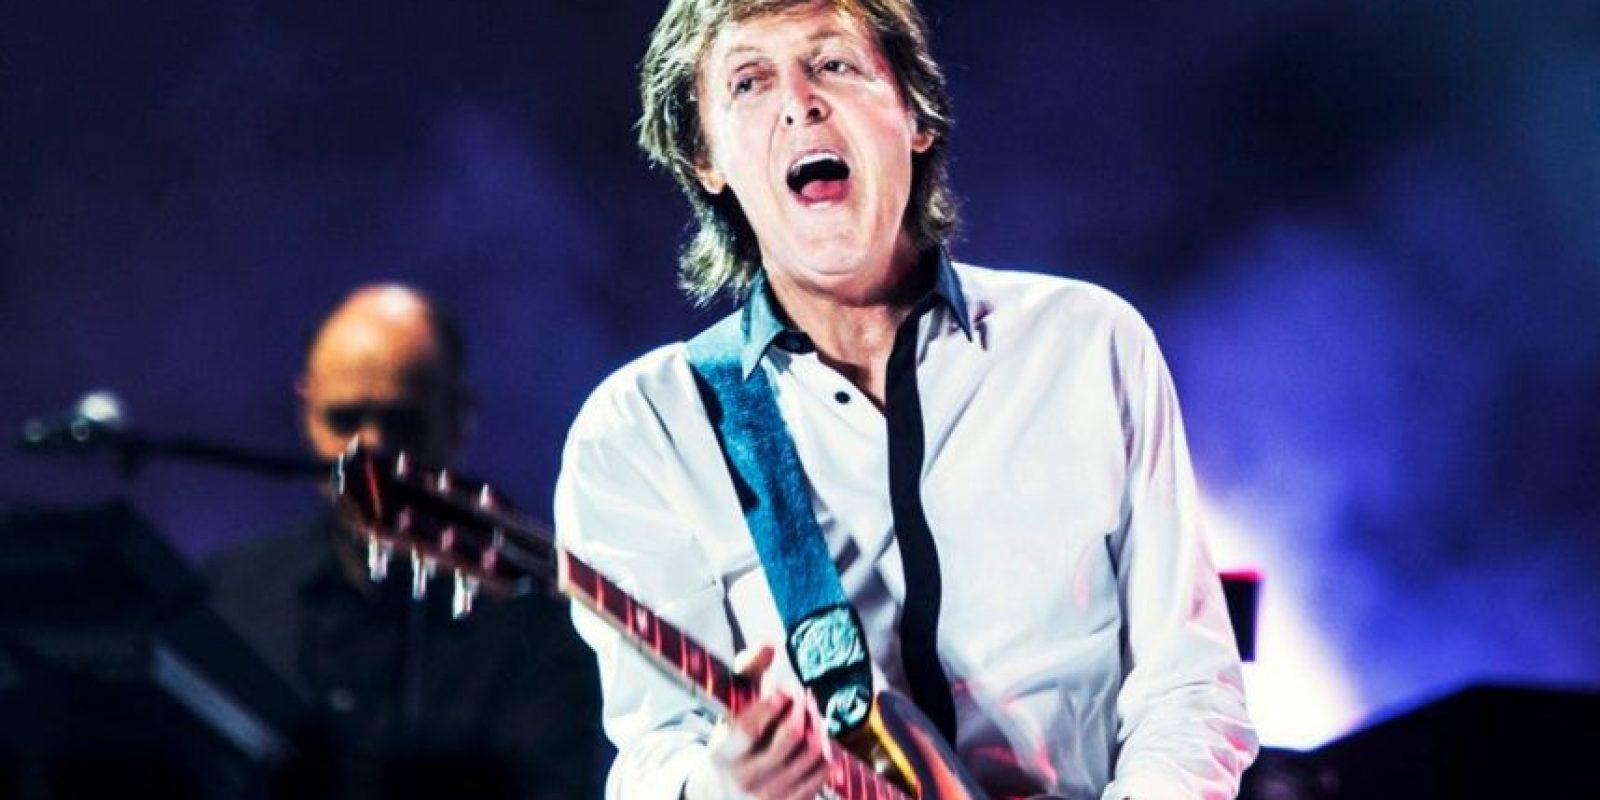 El legendario exBeatle Paul McCartney le dio un conmovedor adiós. Foto:Vía twitter.com/paulmccartney